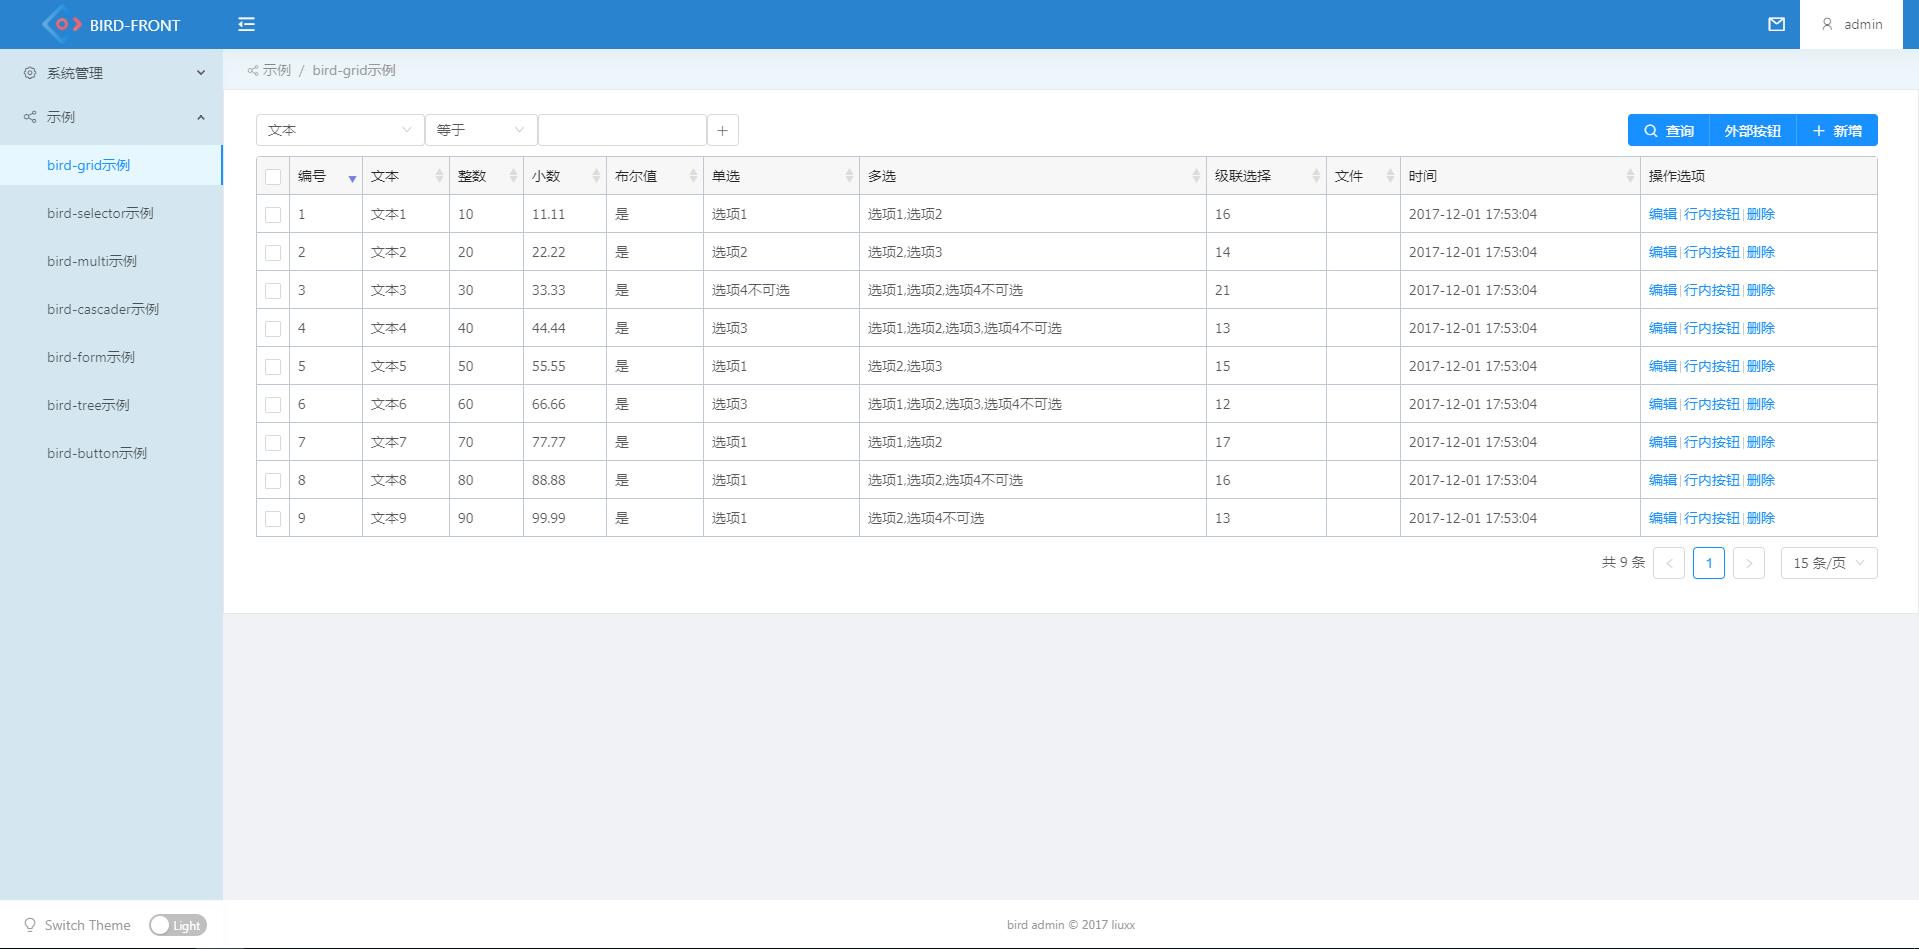 dashboard.png-89.2kB